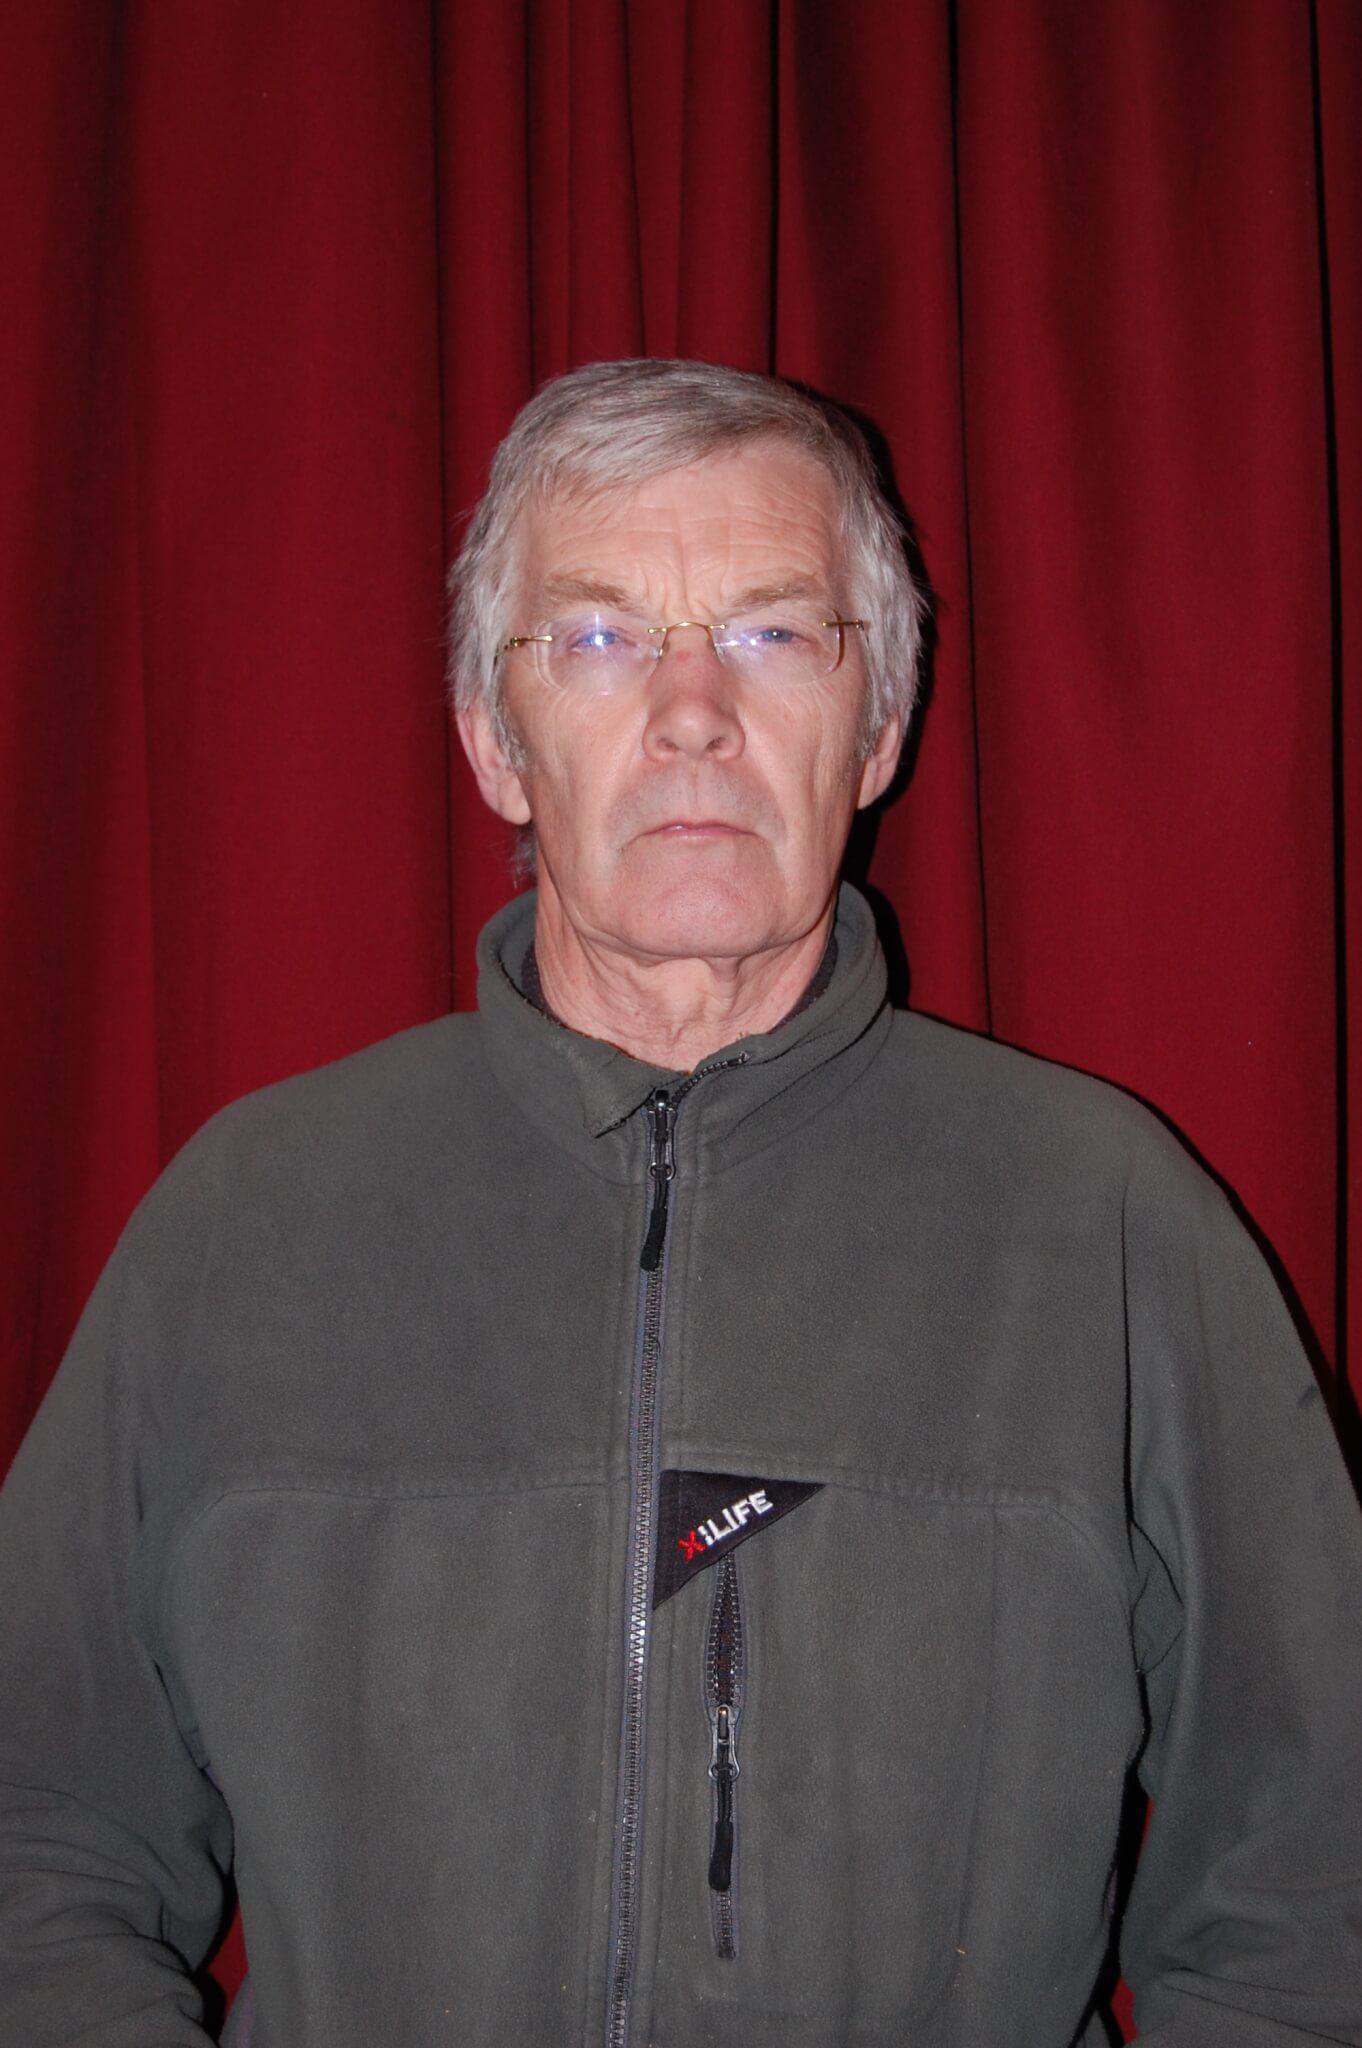 Peter Dobson